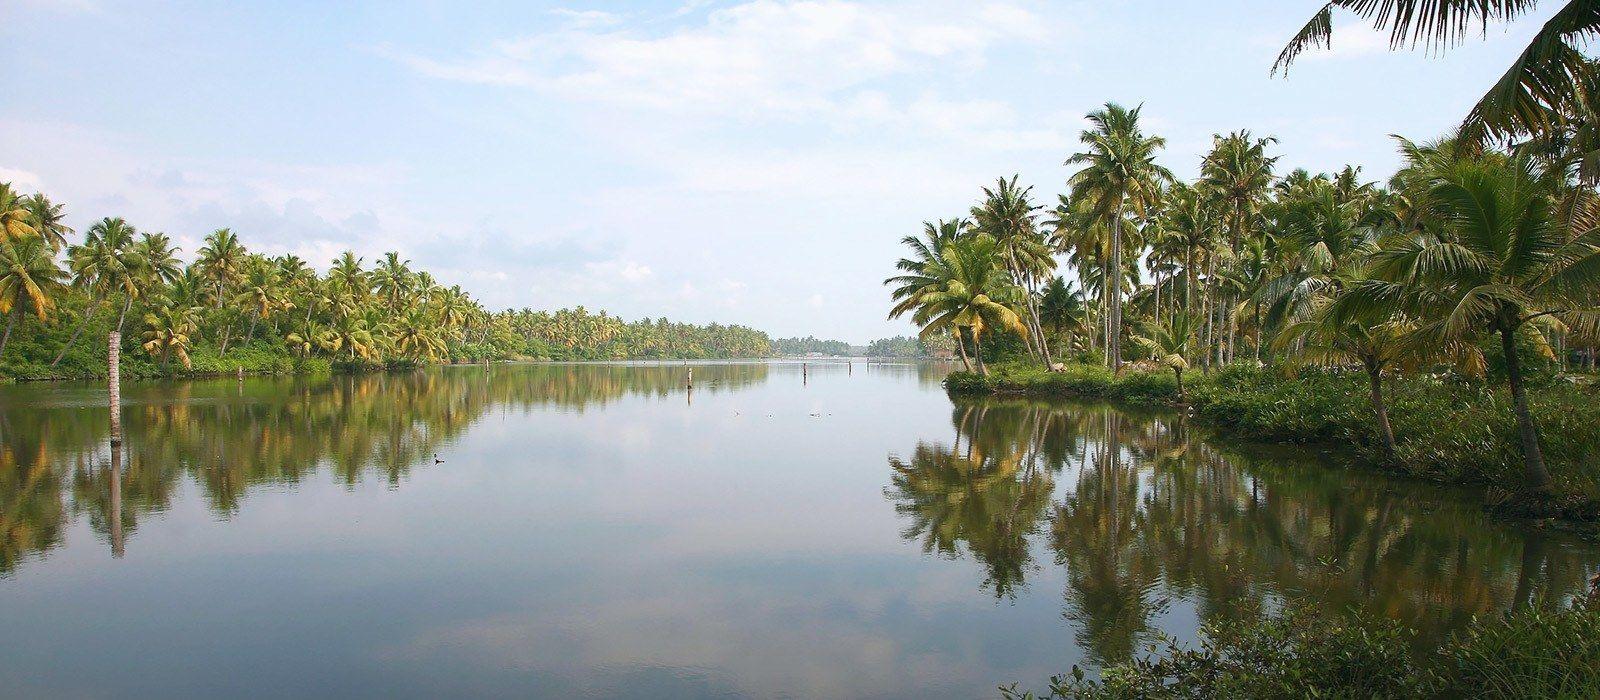 Los canales de Kerala Tour Trip 4